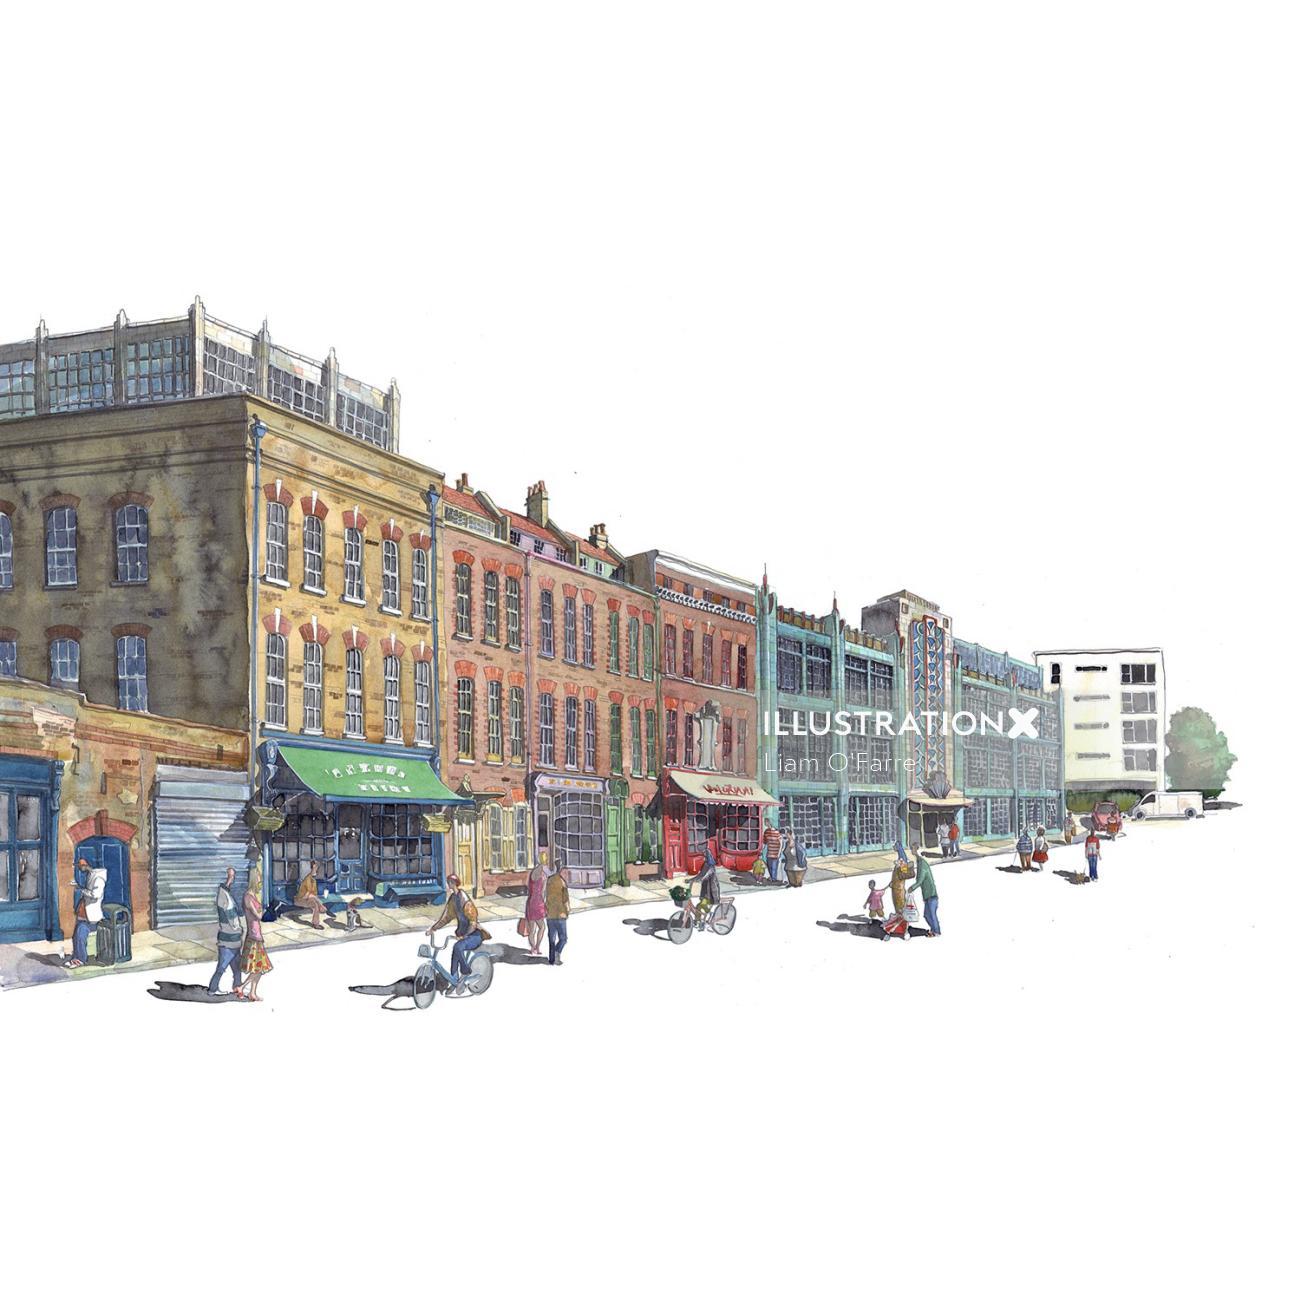 Architecture, cityscape, street, London, watercolour